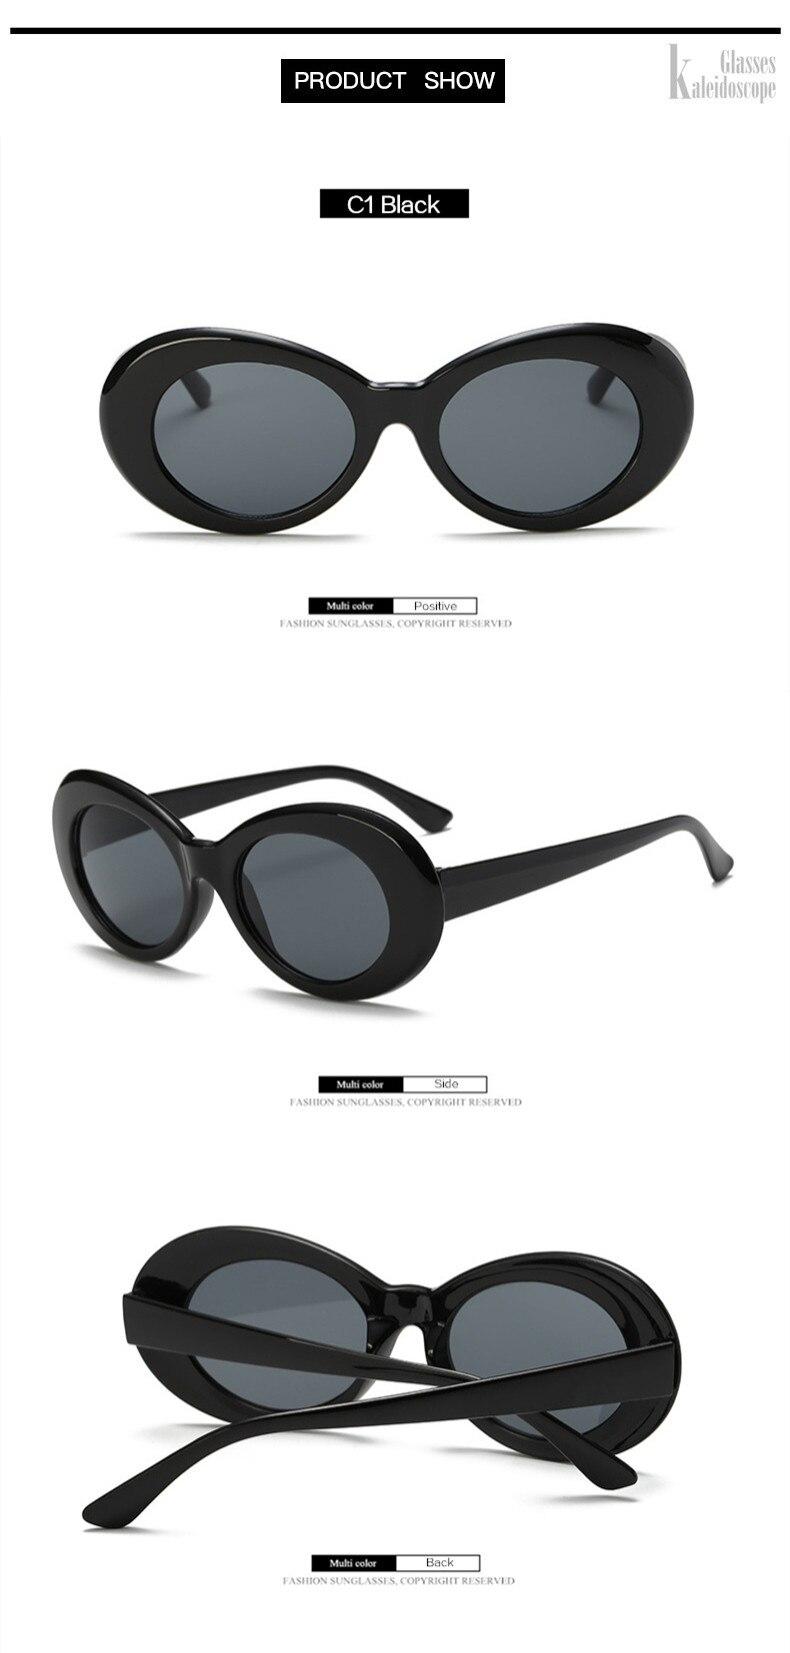 e3d91b83f0 ... Kaleidoscope Glasses Clout Goggles Sunglasses Kurt Cobain Eyeglasses  Women Brand Designer Sunglass Men Retro Round Sun ...